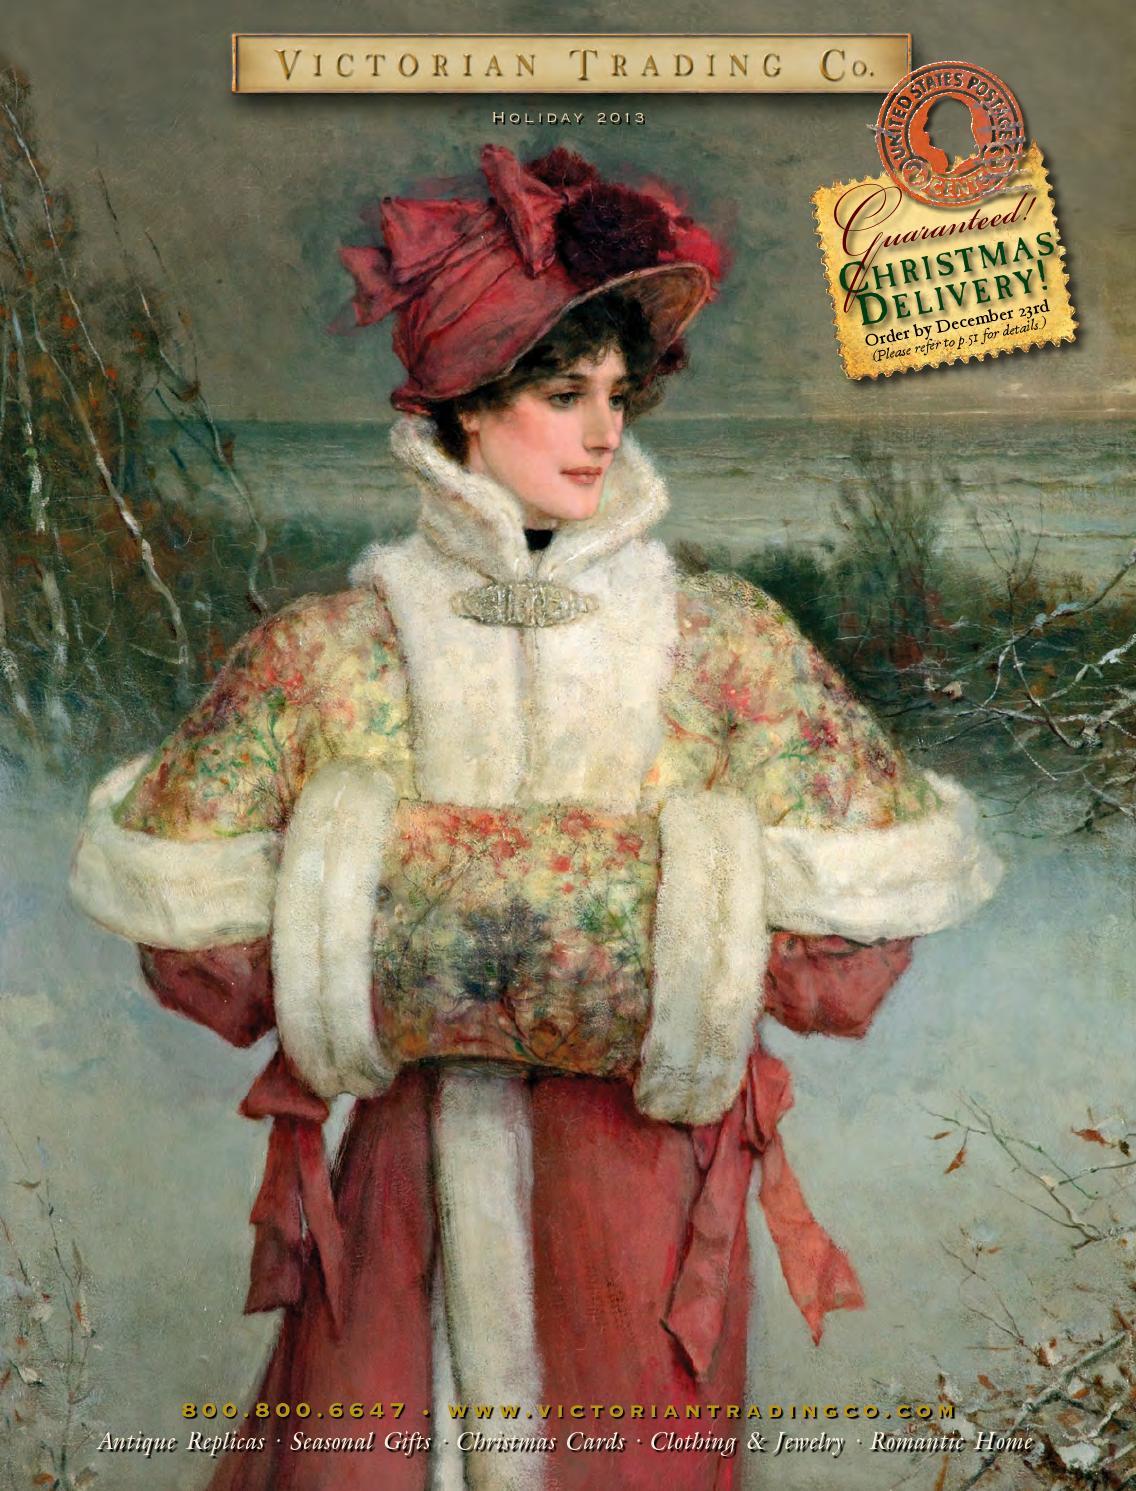 Victorian Trading Co. by Victorian Trading Co. - issuu